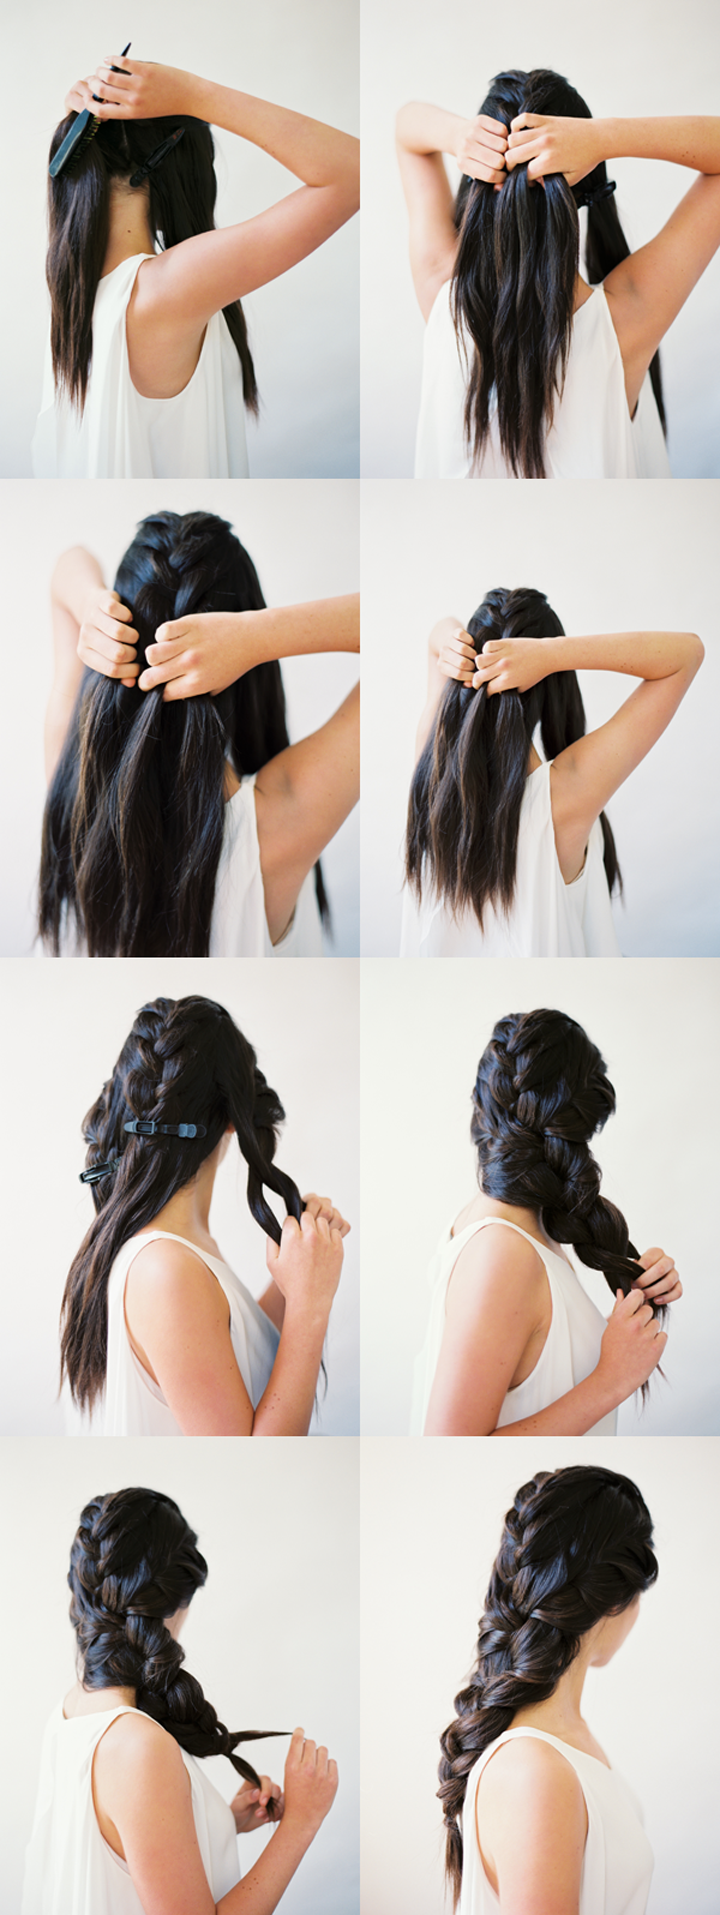 Pin by linda morf on hairstyles pinterest dark hair big braids